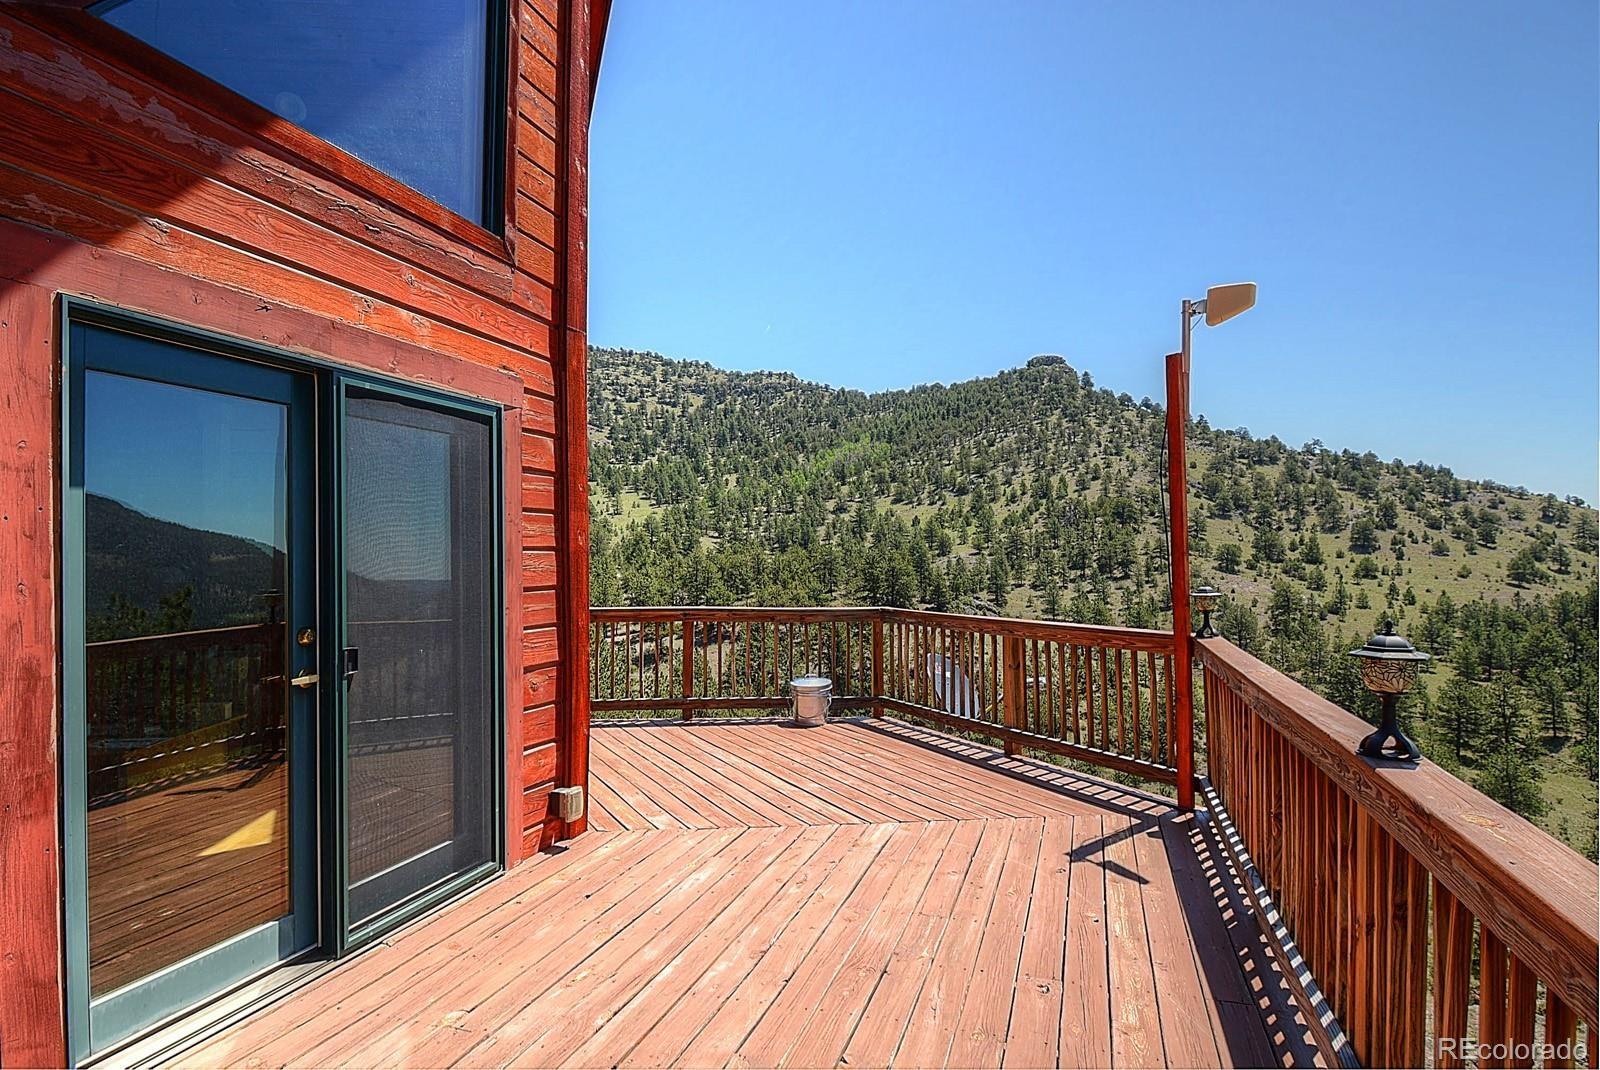 MLS# 8182693 - 26 - 396 Eagle Nest Trail, Guffey, CO 80820